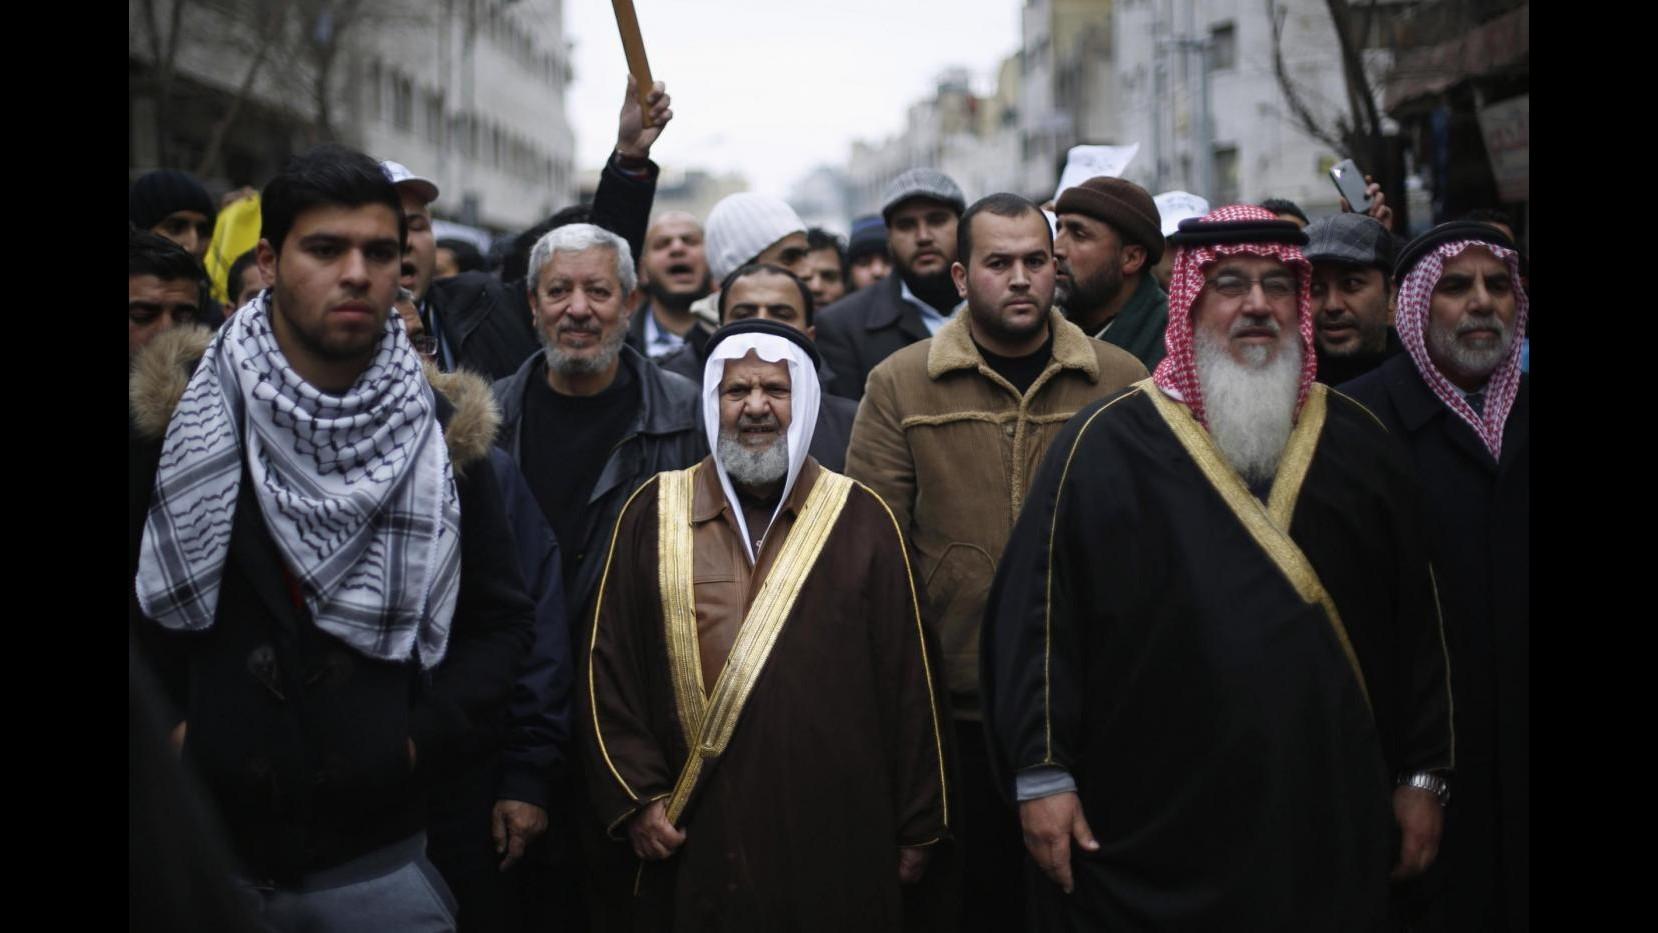 Giordania, criticò Emirati Arabi: carcere per leader Fratelli musulmani